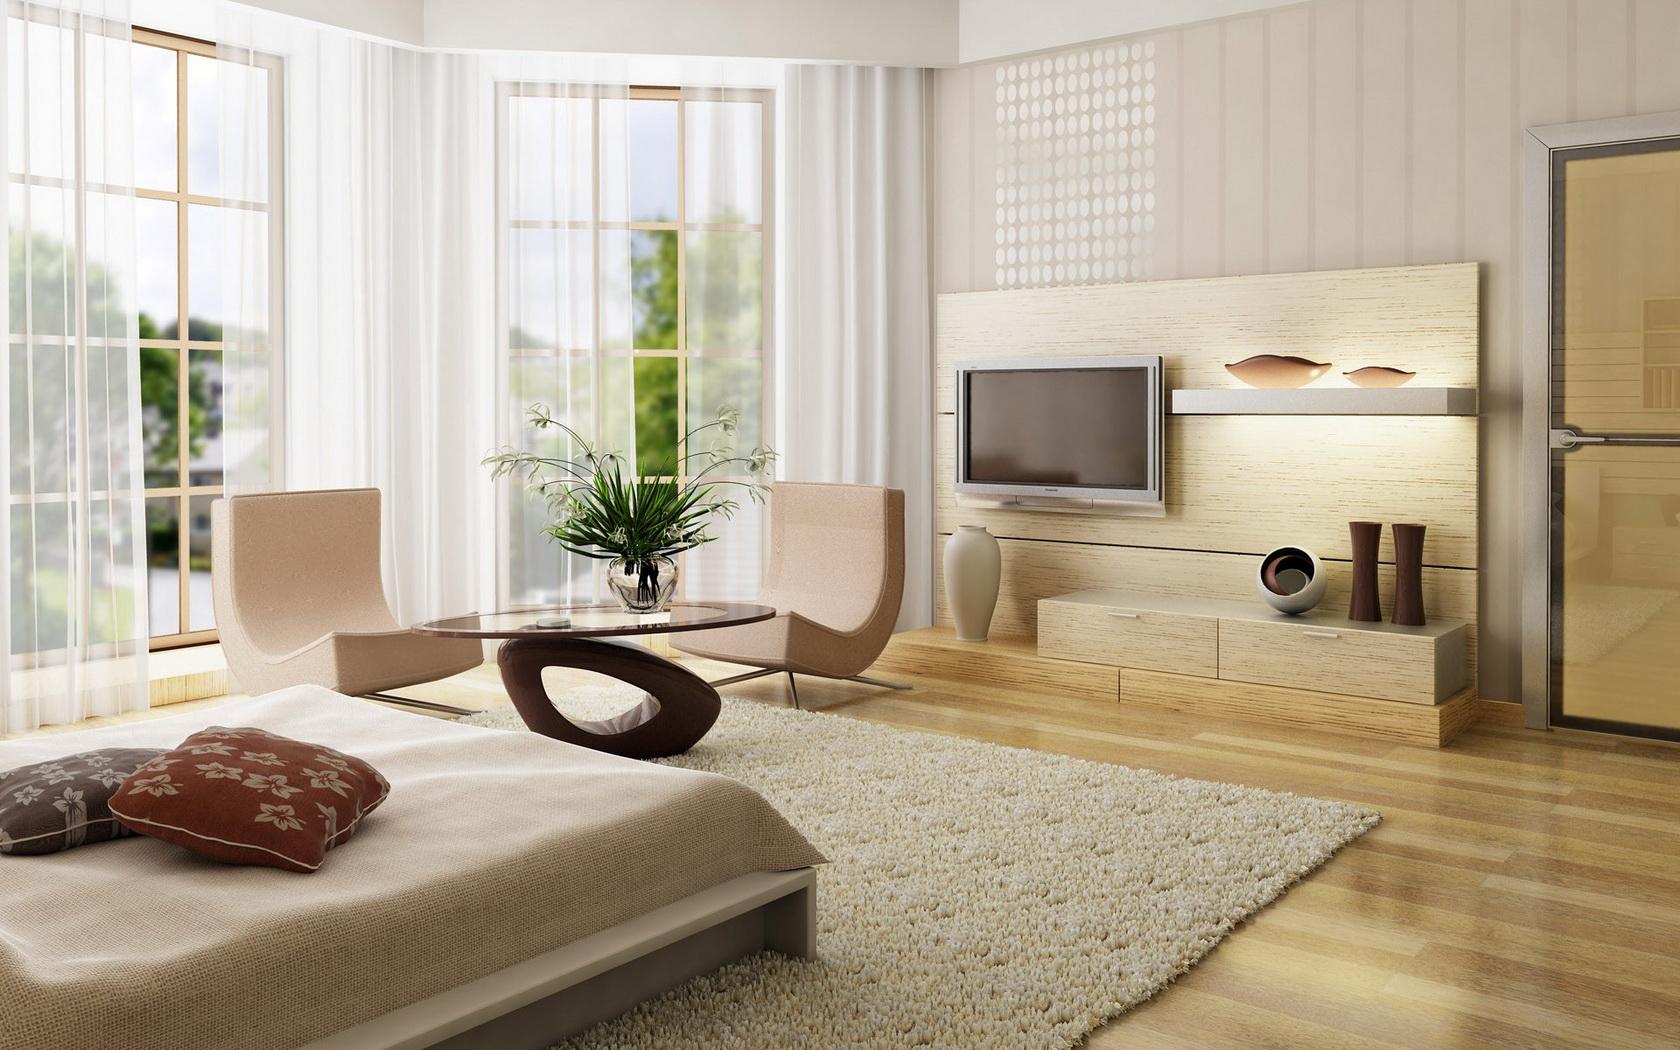 Bedroom Bed Architecture Interior Design Wallpaper | 1680x1050 | 148309 |  WallpaperUP